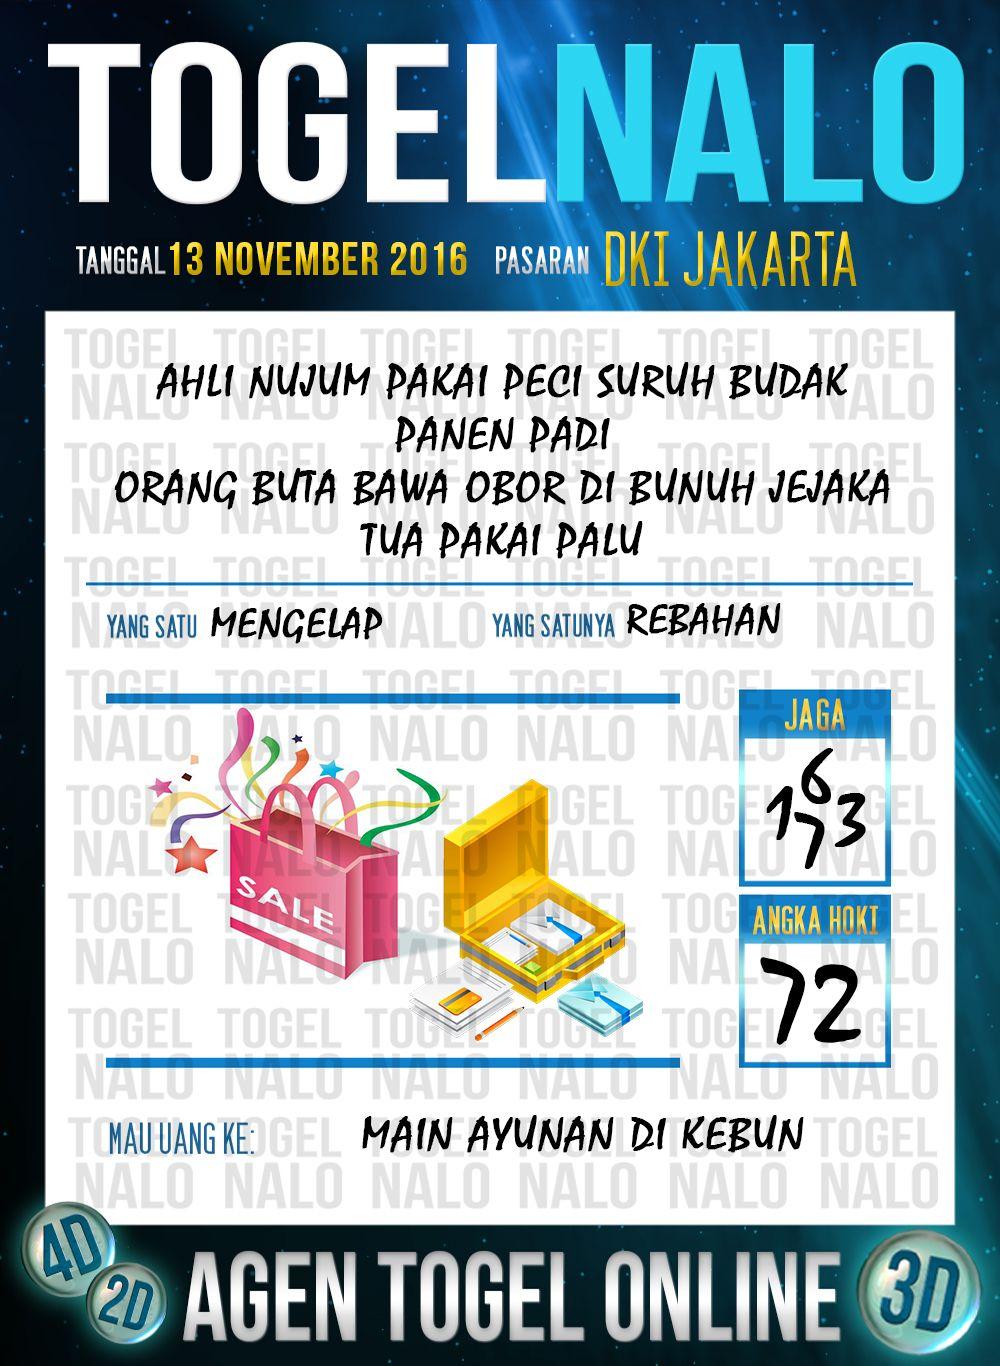 Angka Main 4D Togel Wap Online Live Draw 4D TogelNalo DKI Jakarta 13 November 2016